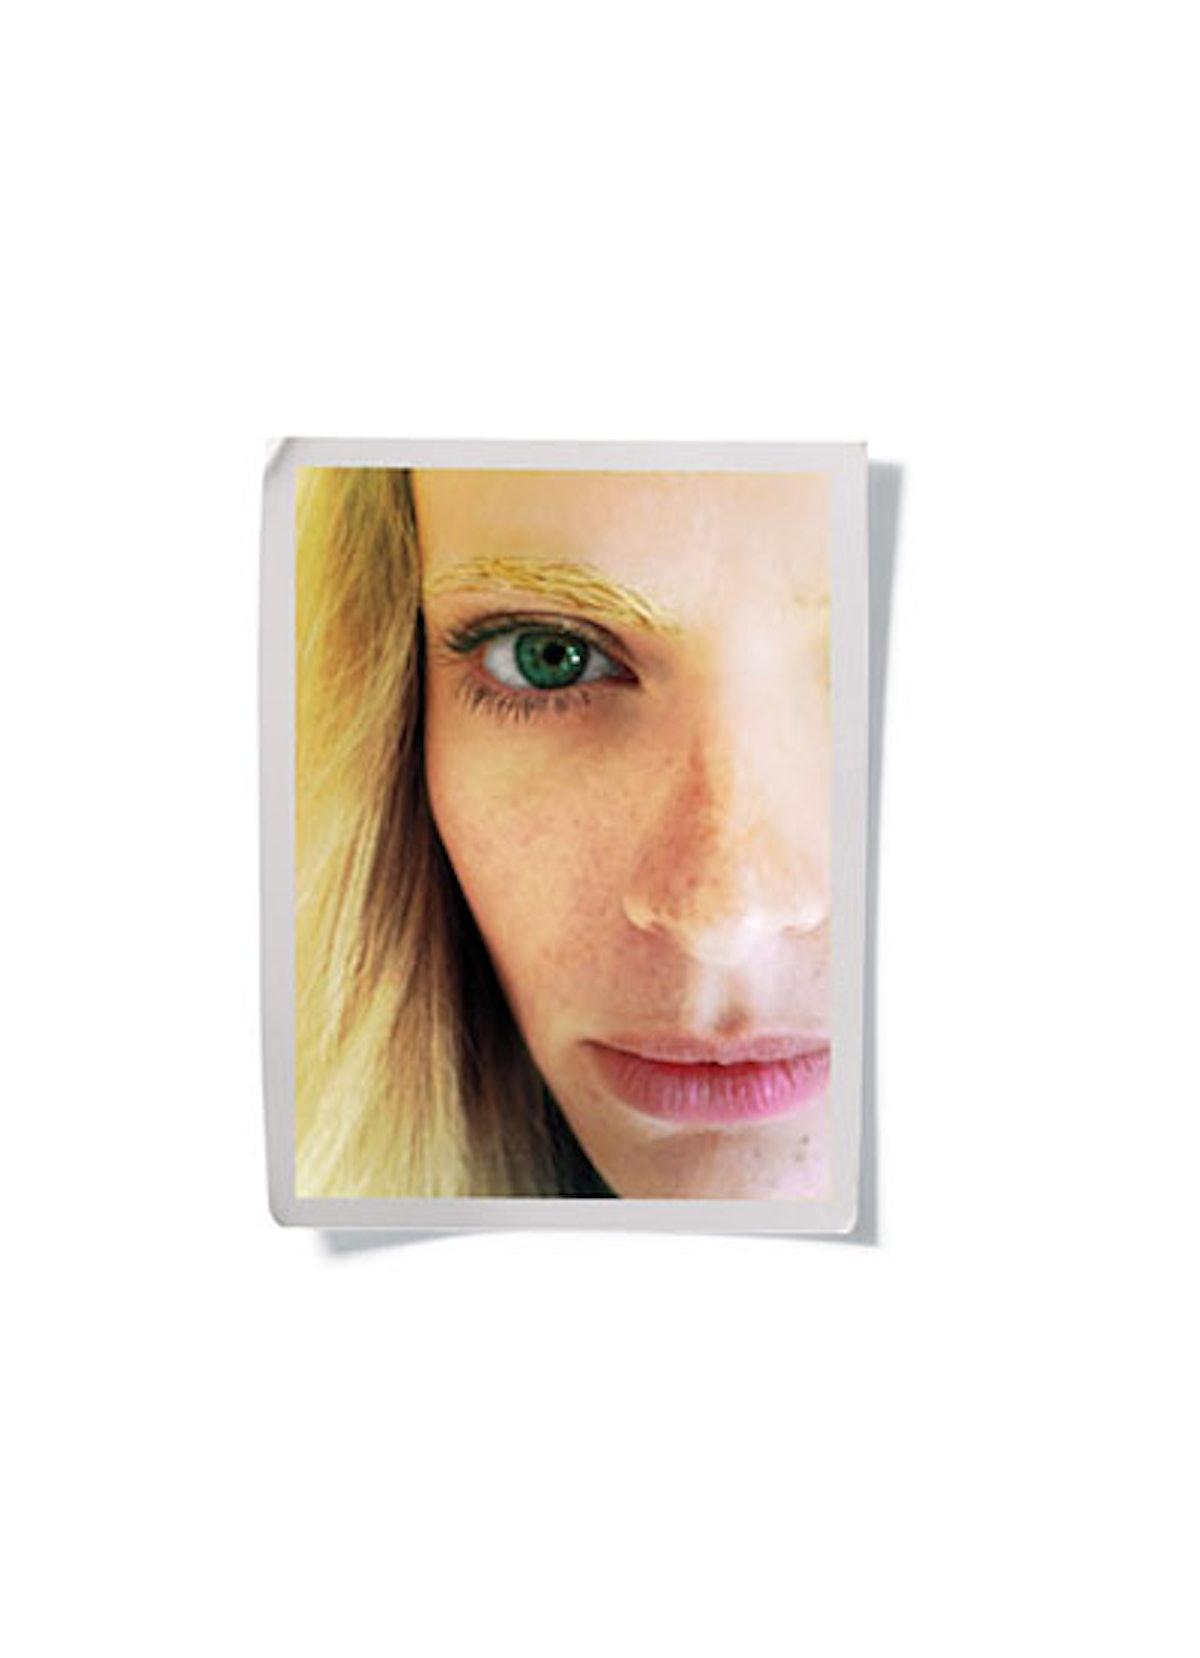 bess-janes-addiction-sept-2012-03-v.jpg